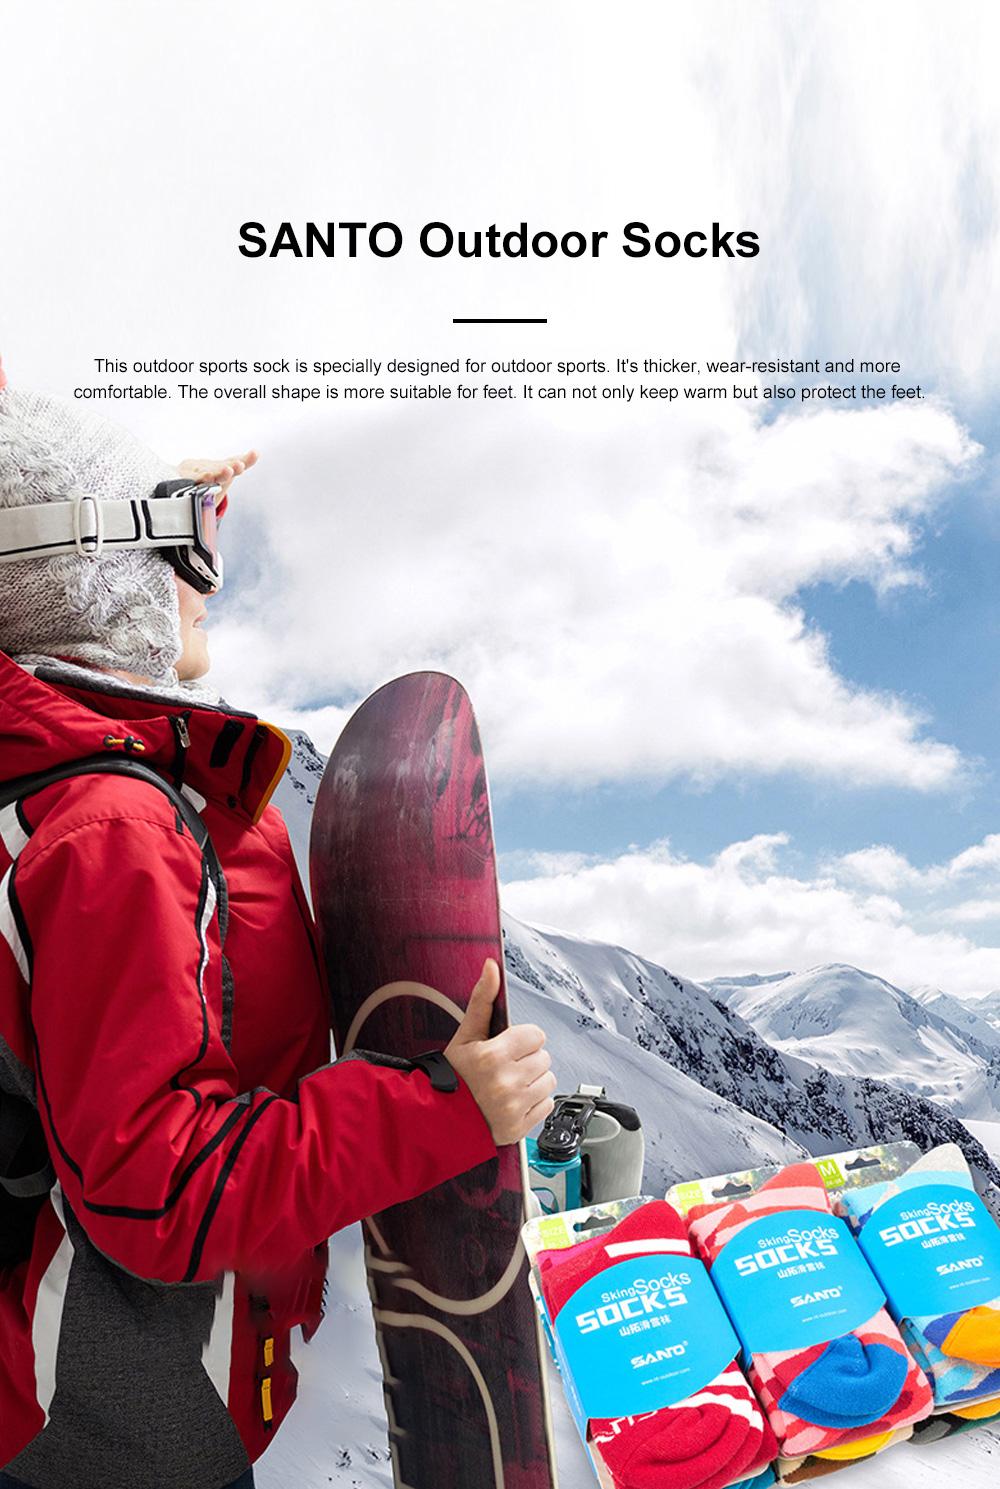 SANTO Outdoor Socks Winter Warm Ski Socks Sports Socks Sweat Absorbing Thickening Socks Long Hiking Socks 0